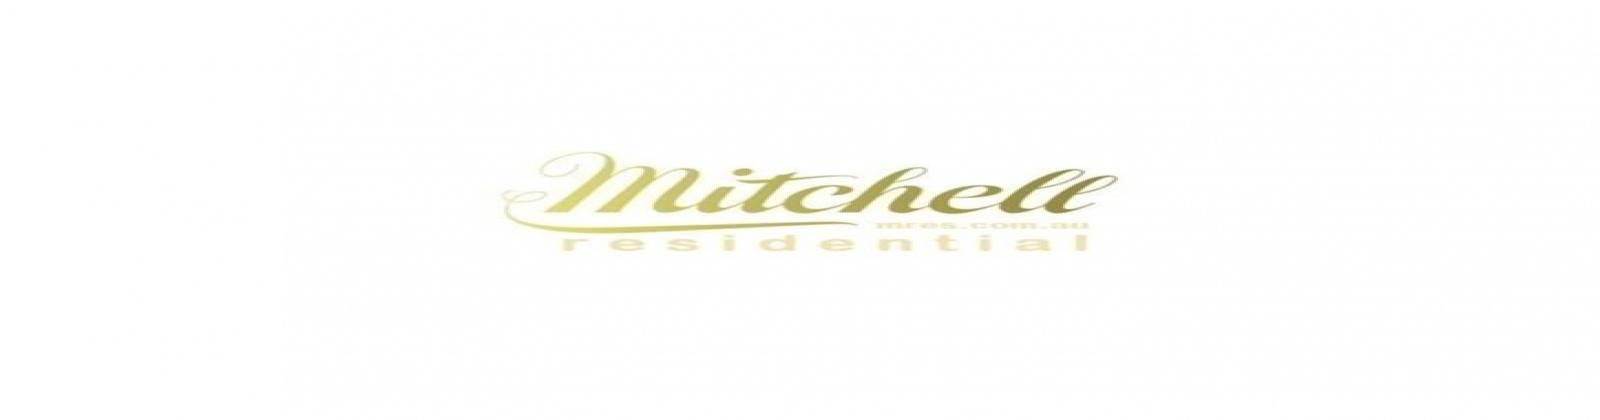 2531 Pebblehill Row, Murcia, Virginia, 3 Bedrooms Bedrooms, 9 Rooms Rooms,3 BathroomsBathrooms,Apartment,For Sale,1004